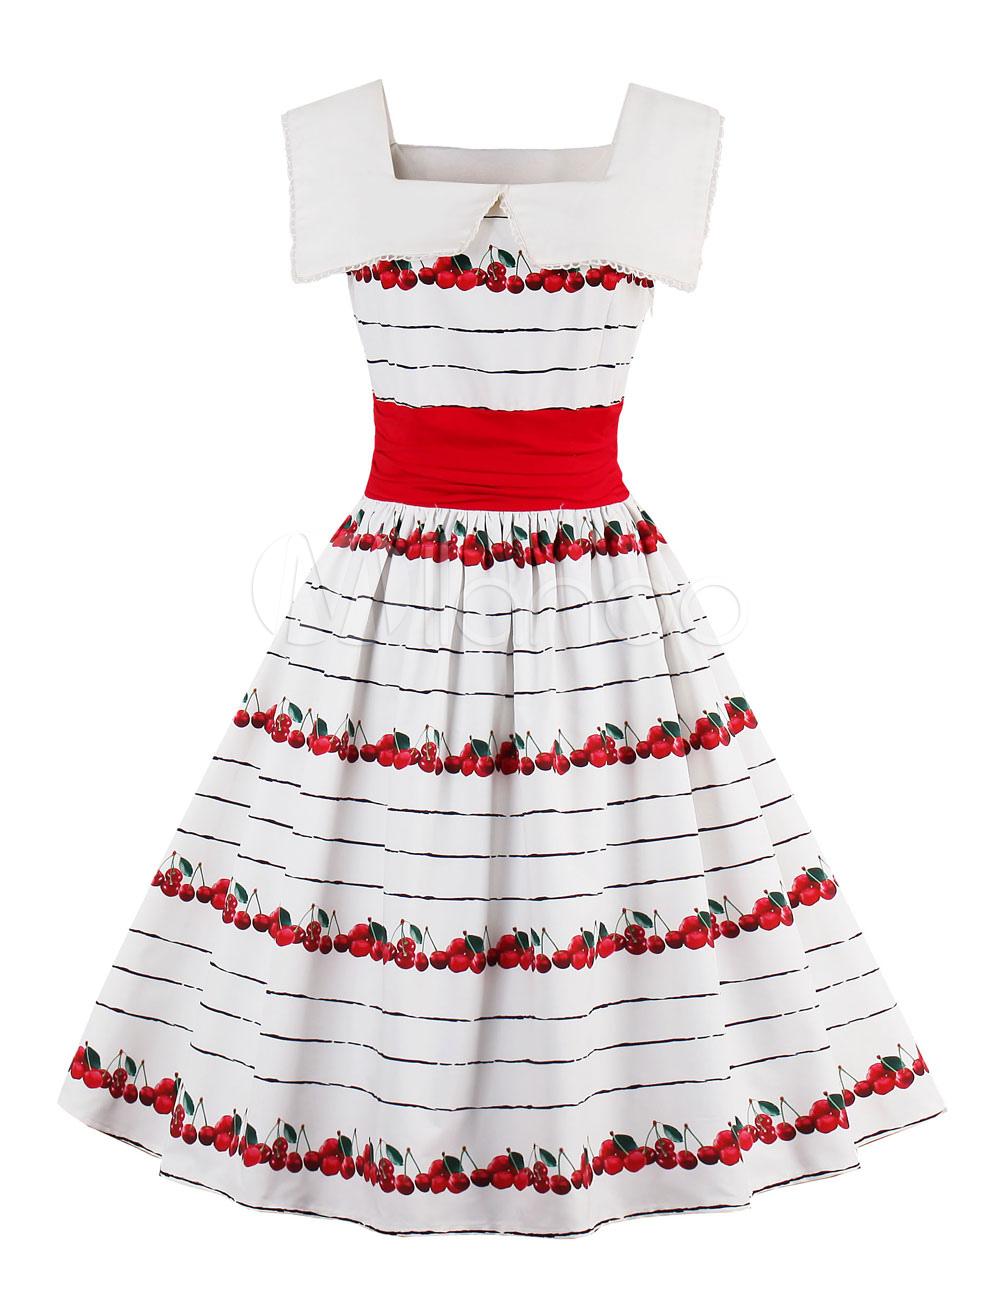 White Vintage Dress Lace Square Neck Sleeveless Fruit Print A Line Women's Short Dresses